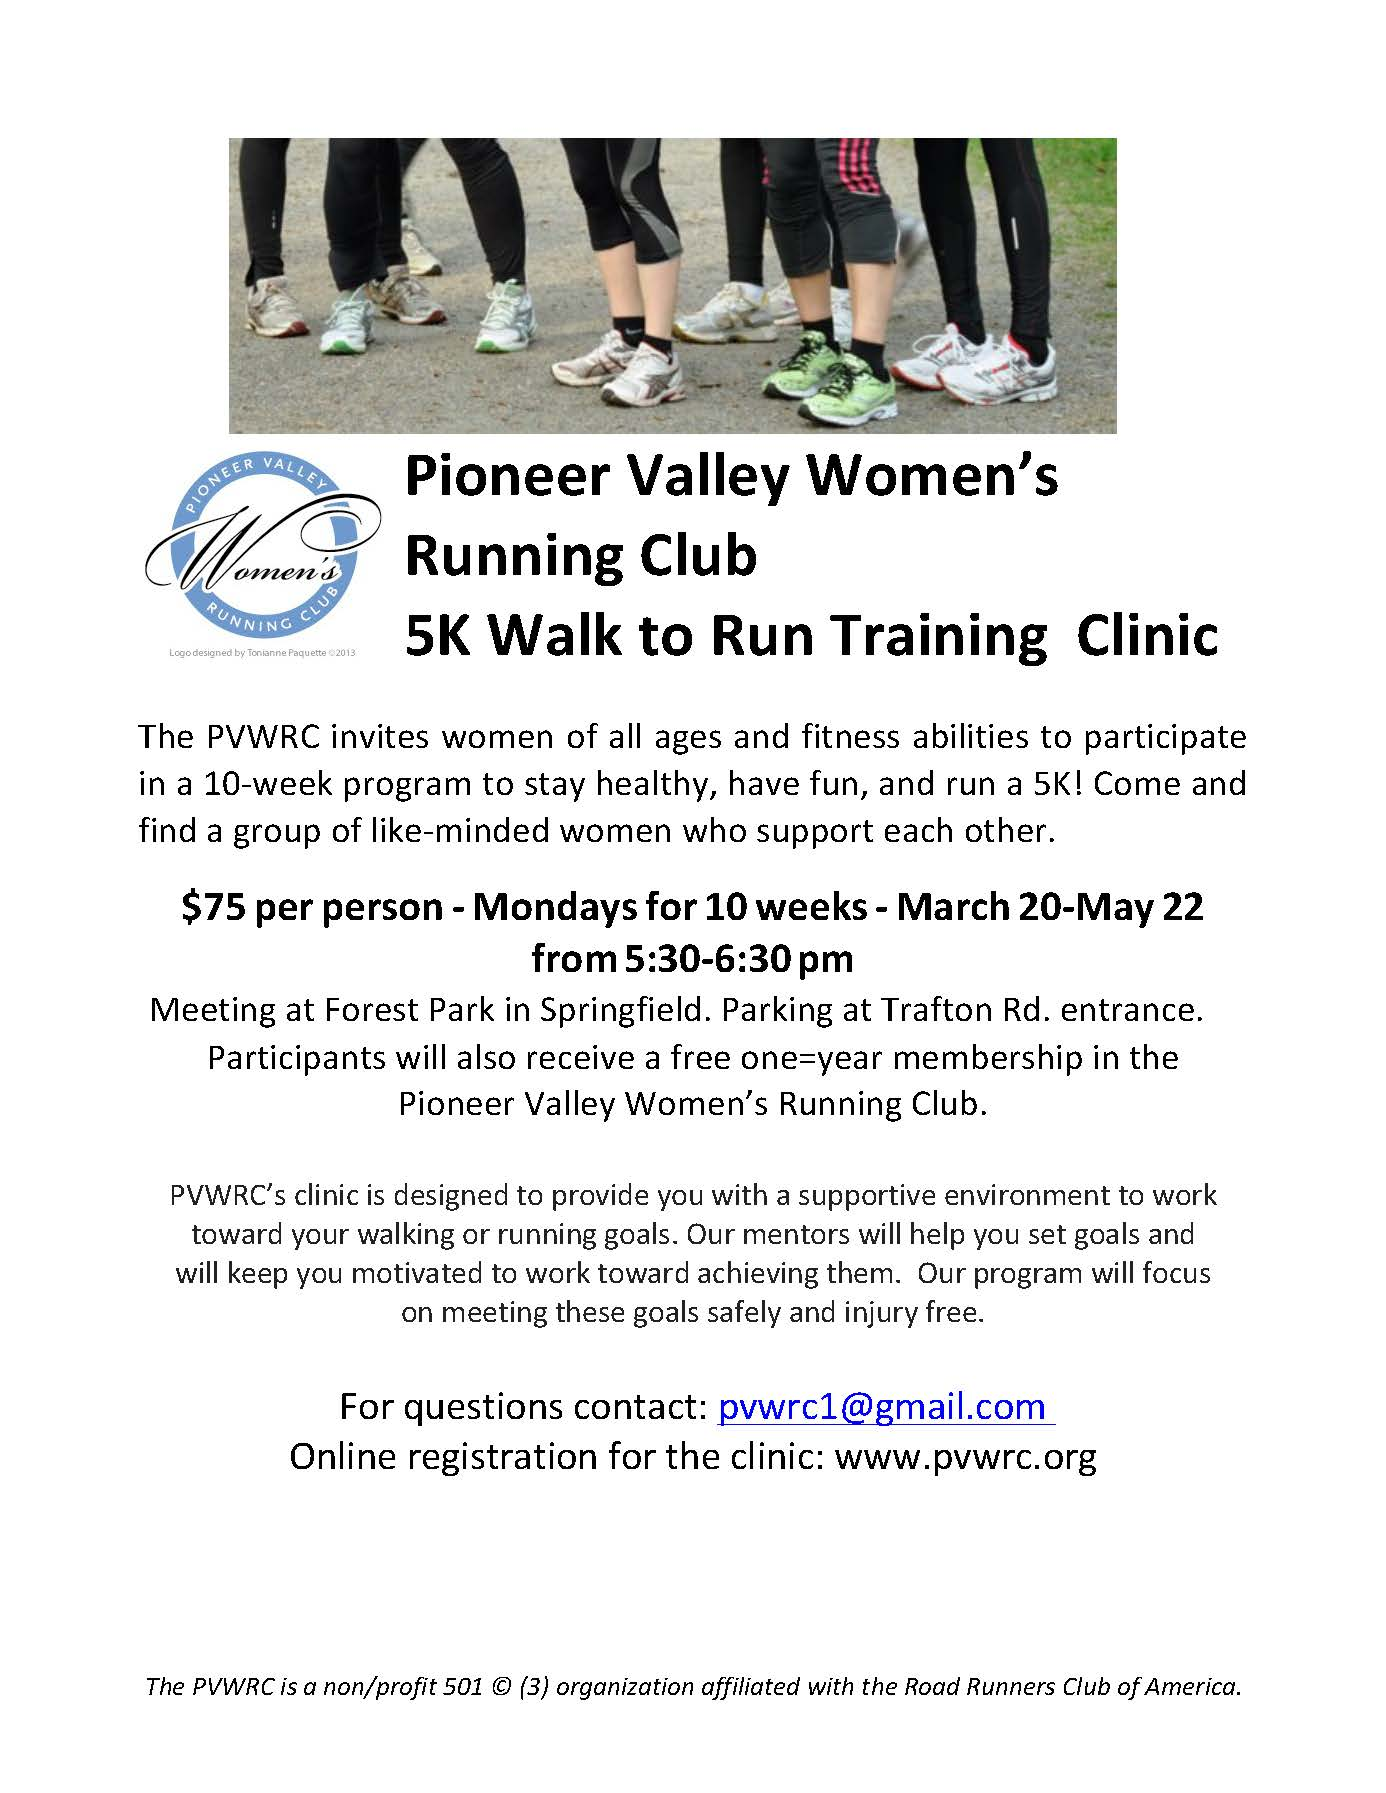 Walk to Run Clinic flyer